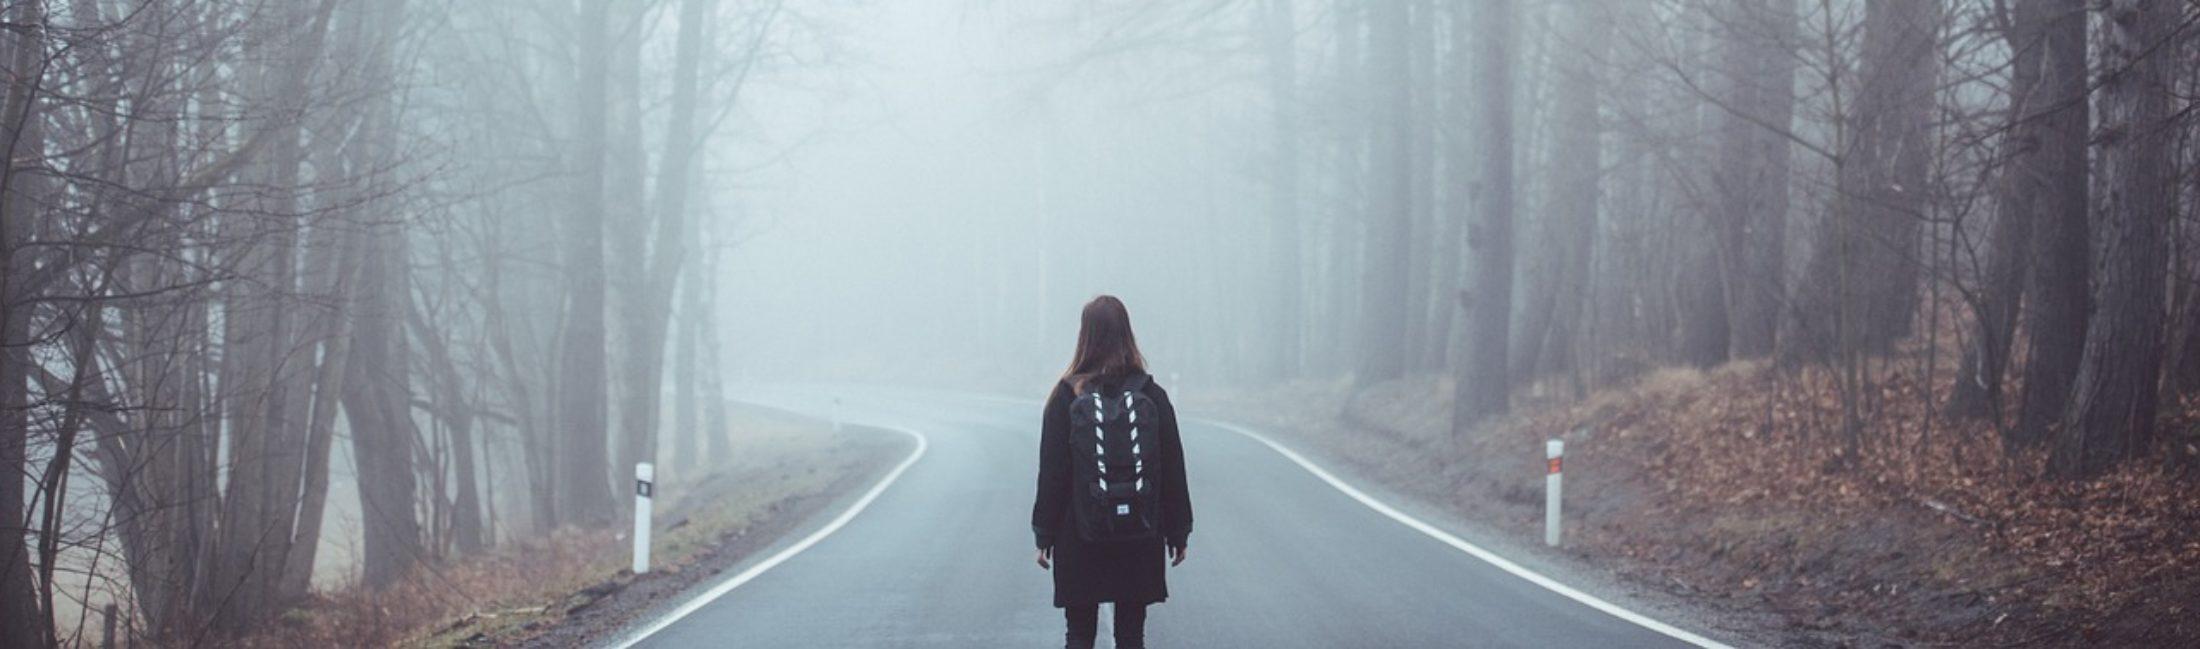 cropped-fog-1208283_1280.jpg